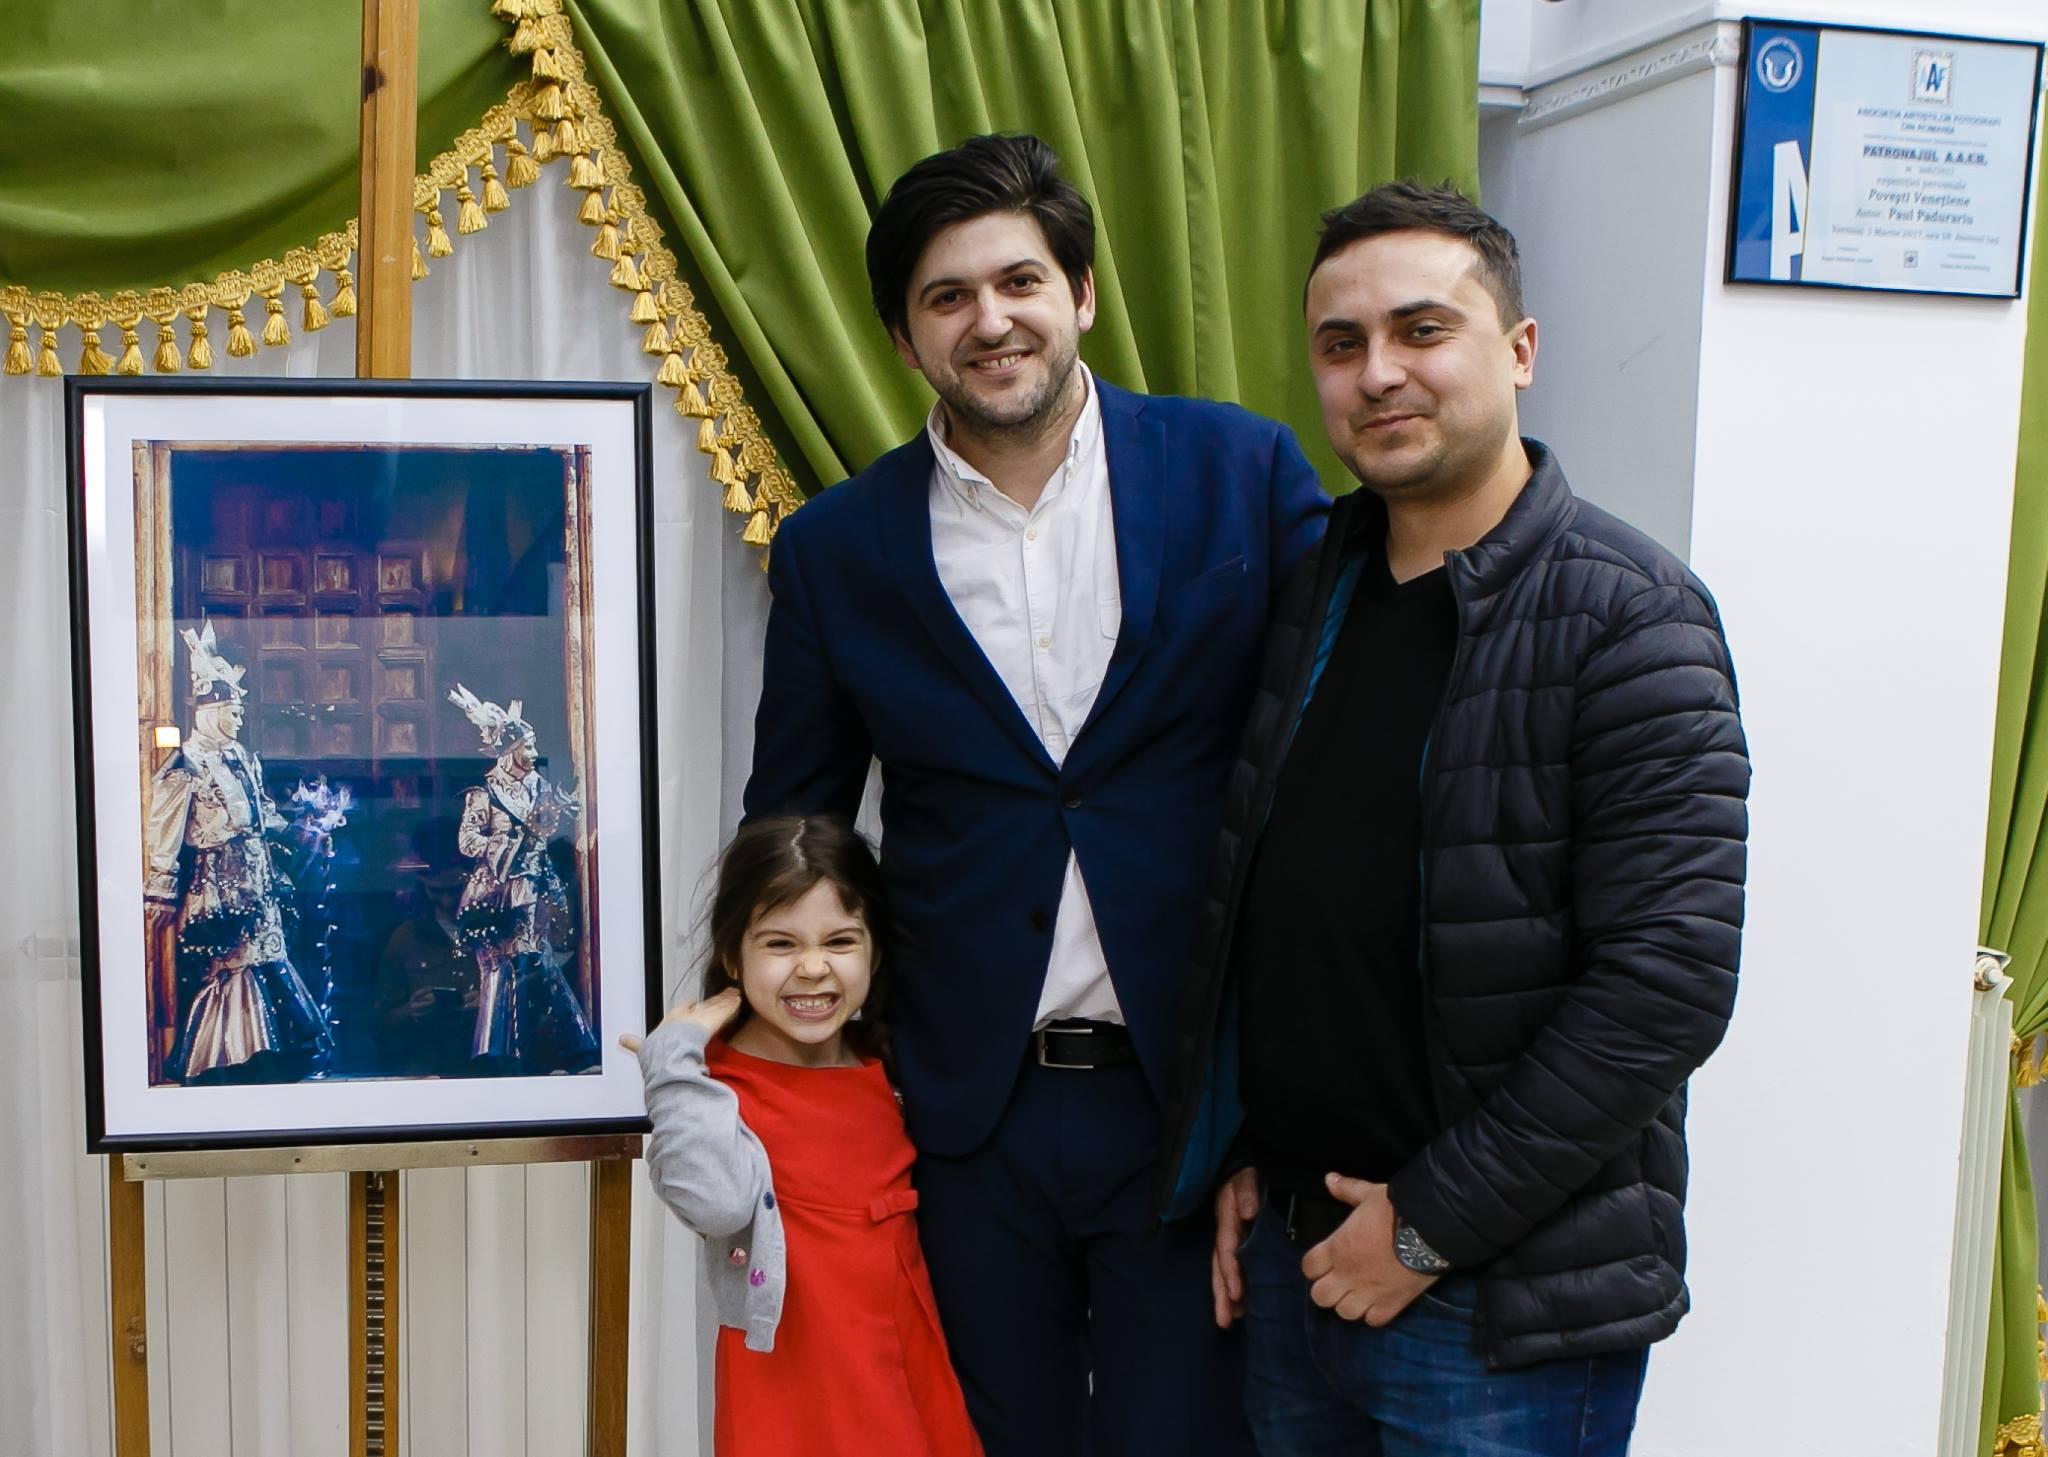 Vernisaj Expozitie de Fotografie Povesti Venetiene Paul Padurariu fotograf profesionist Iasi - fotografie invitat Razvan Oprea